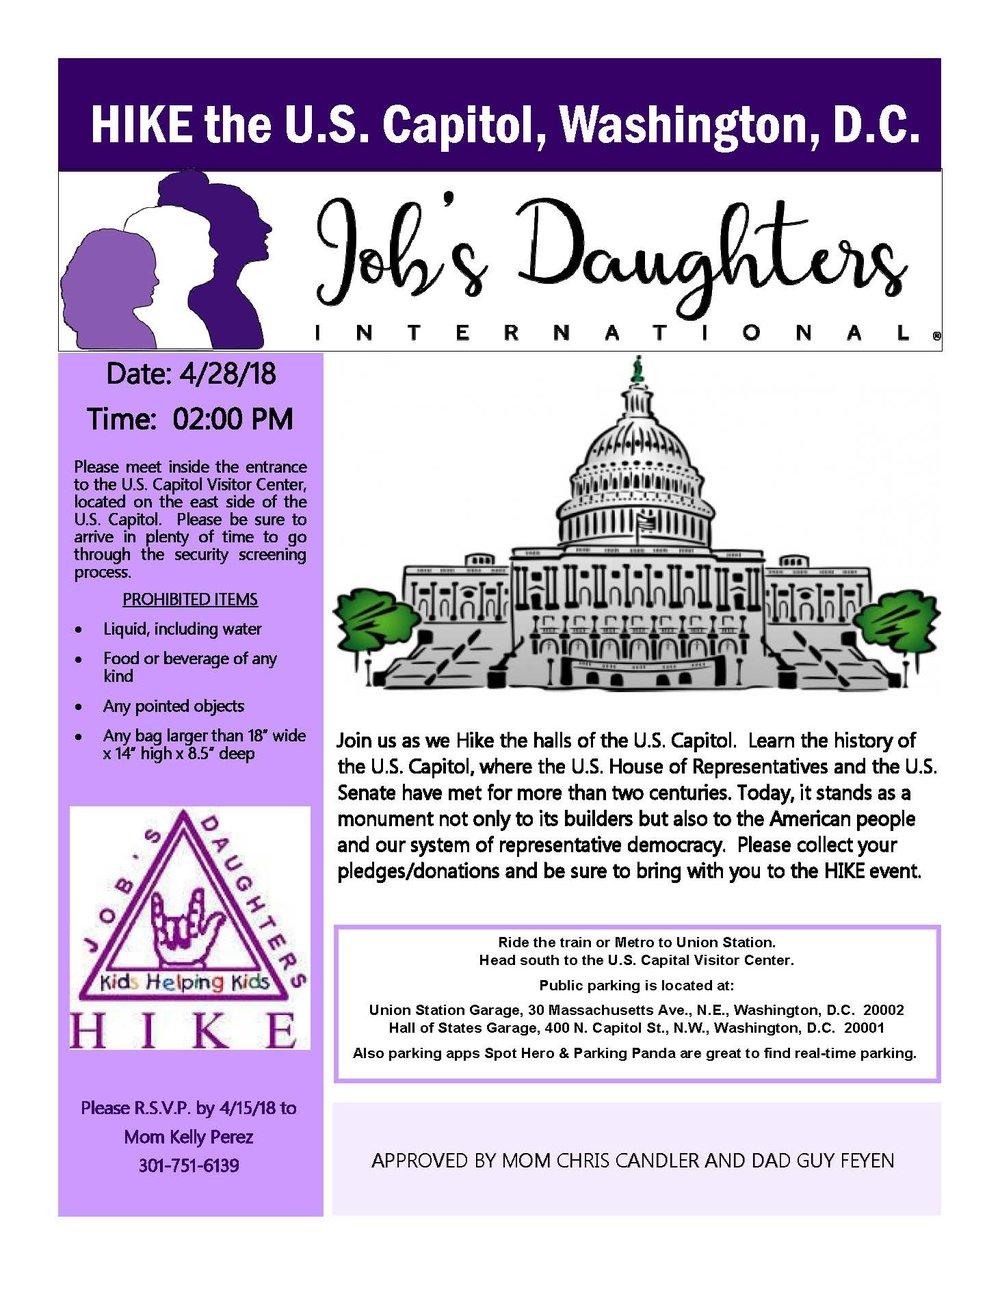 JDI HIKE Capitol Tour Flyer.jpg